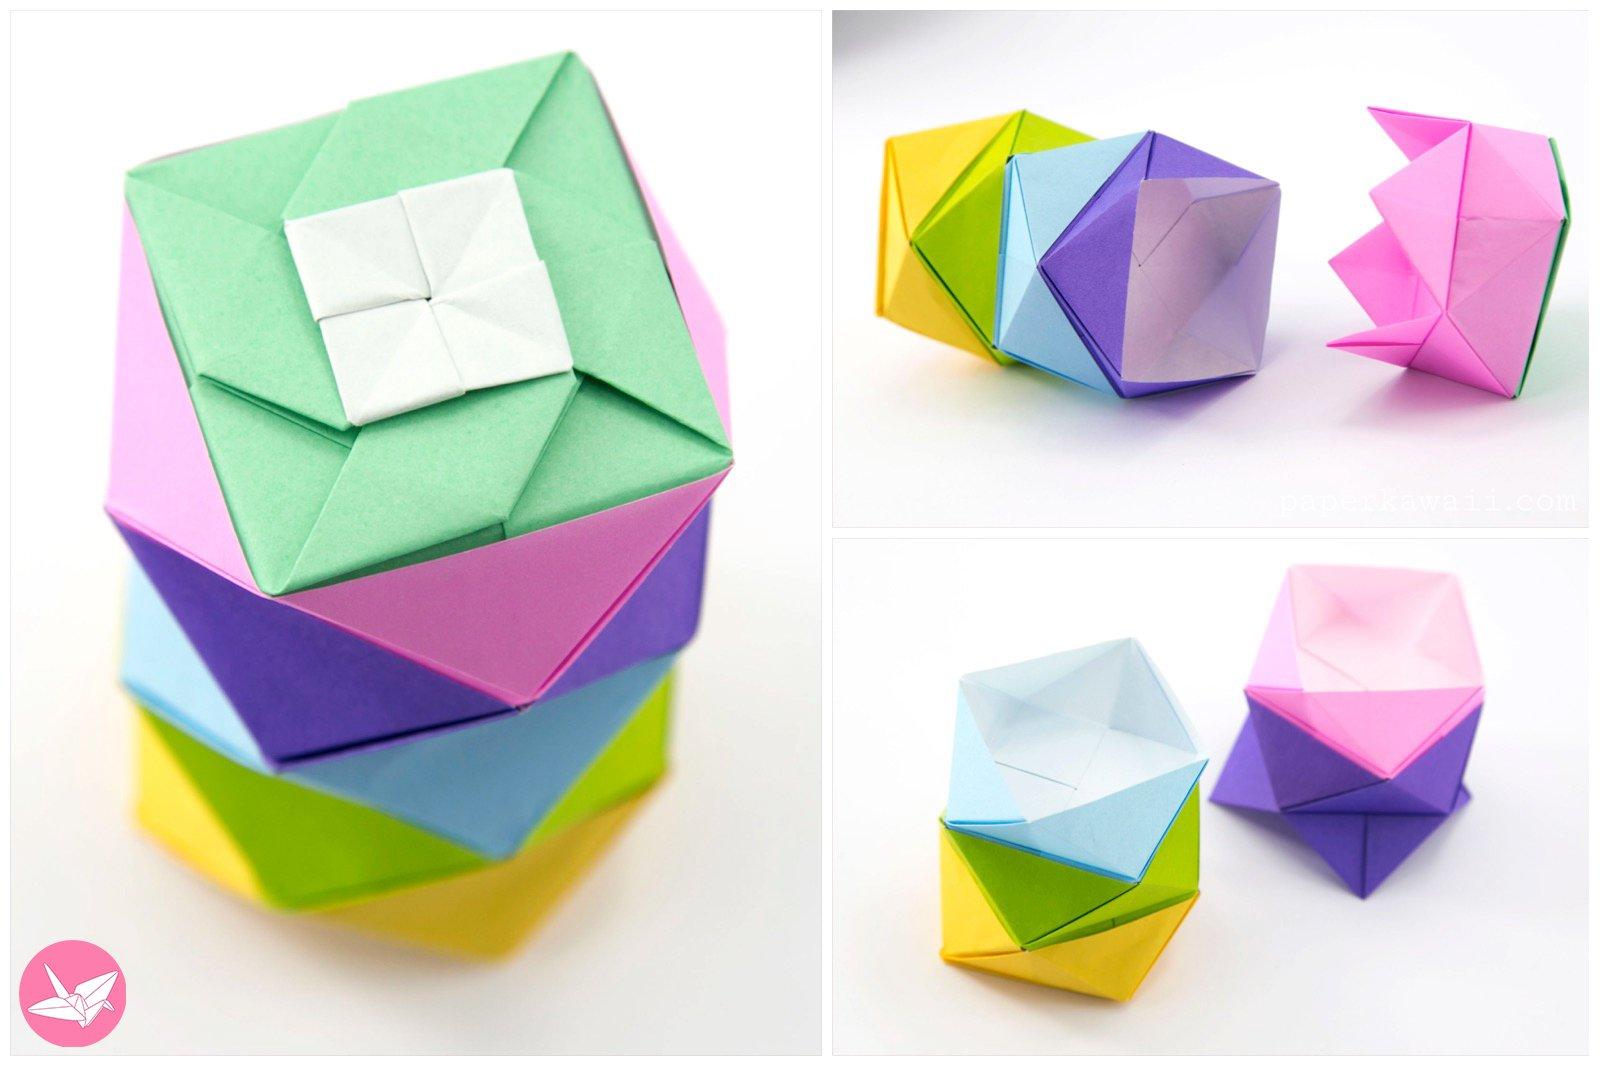 Origami Stacking Boxes Tutorial - Paper Kawaii - photo#24